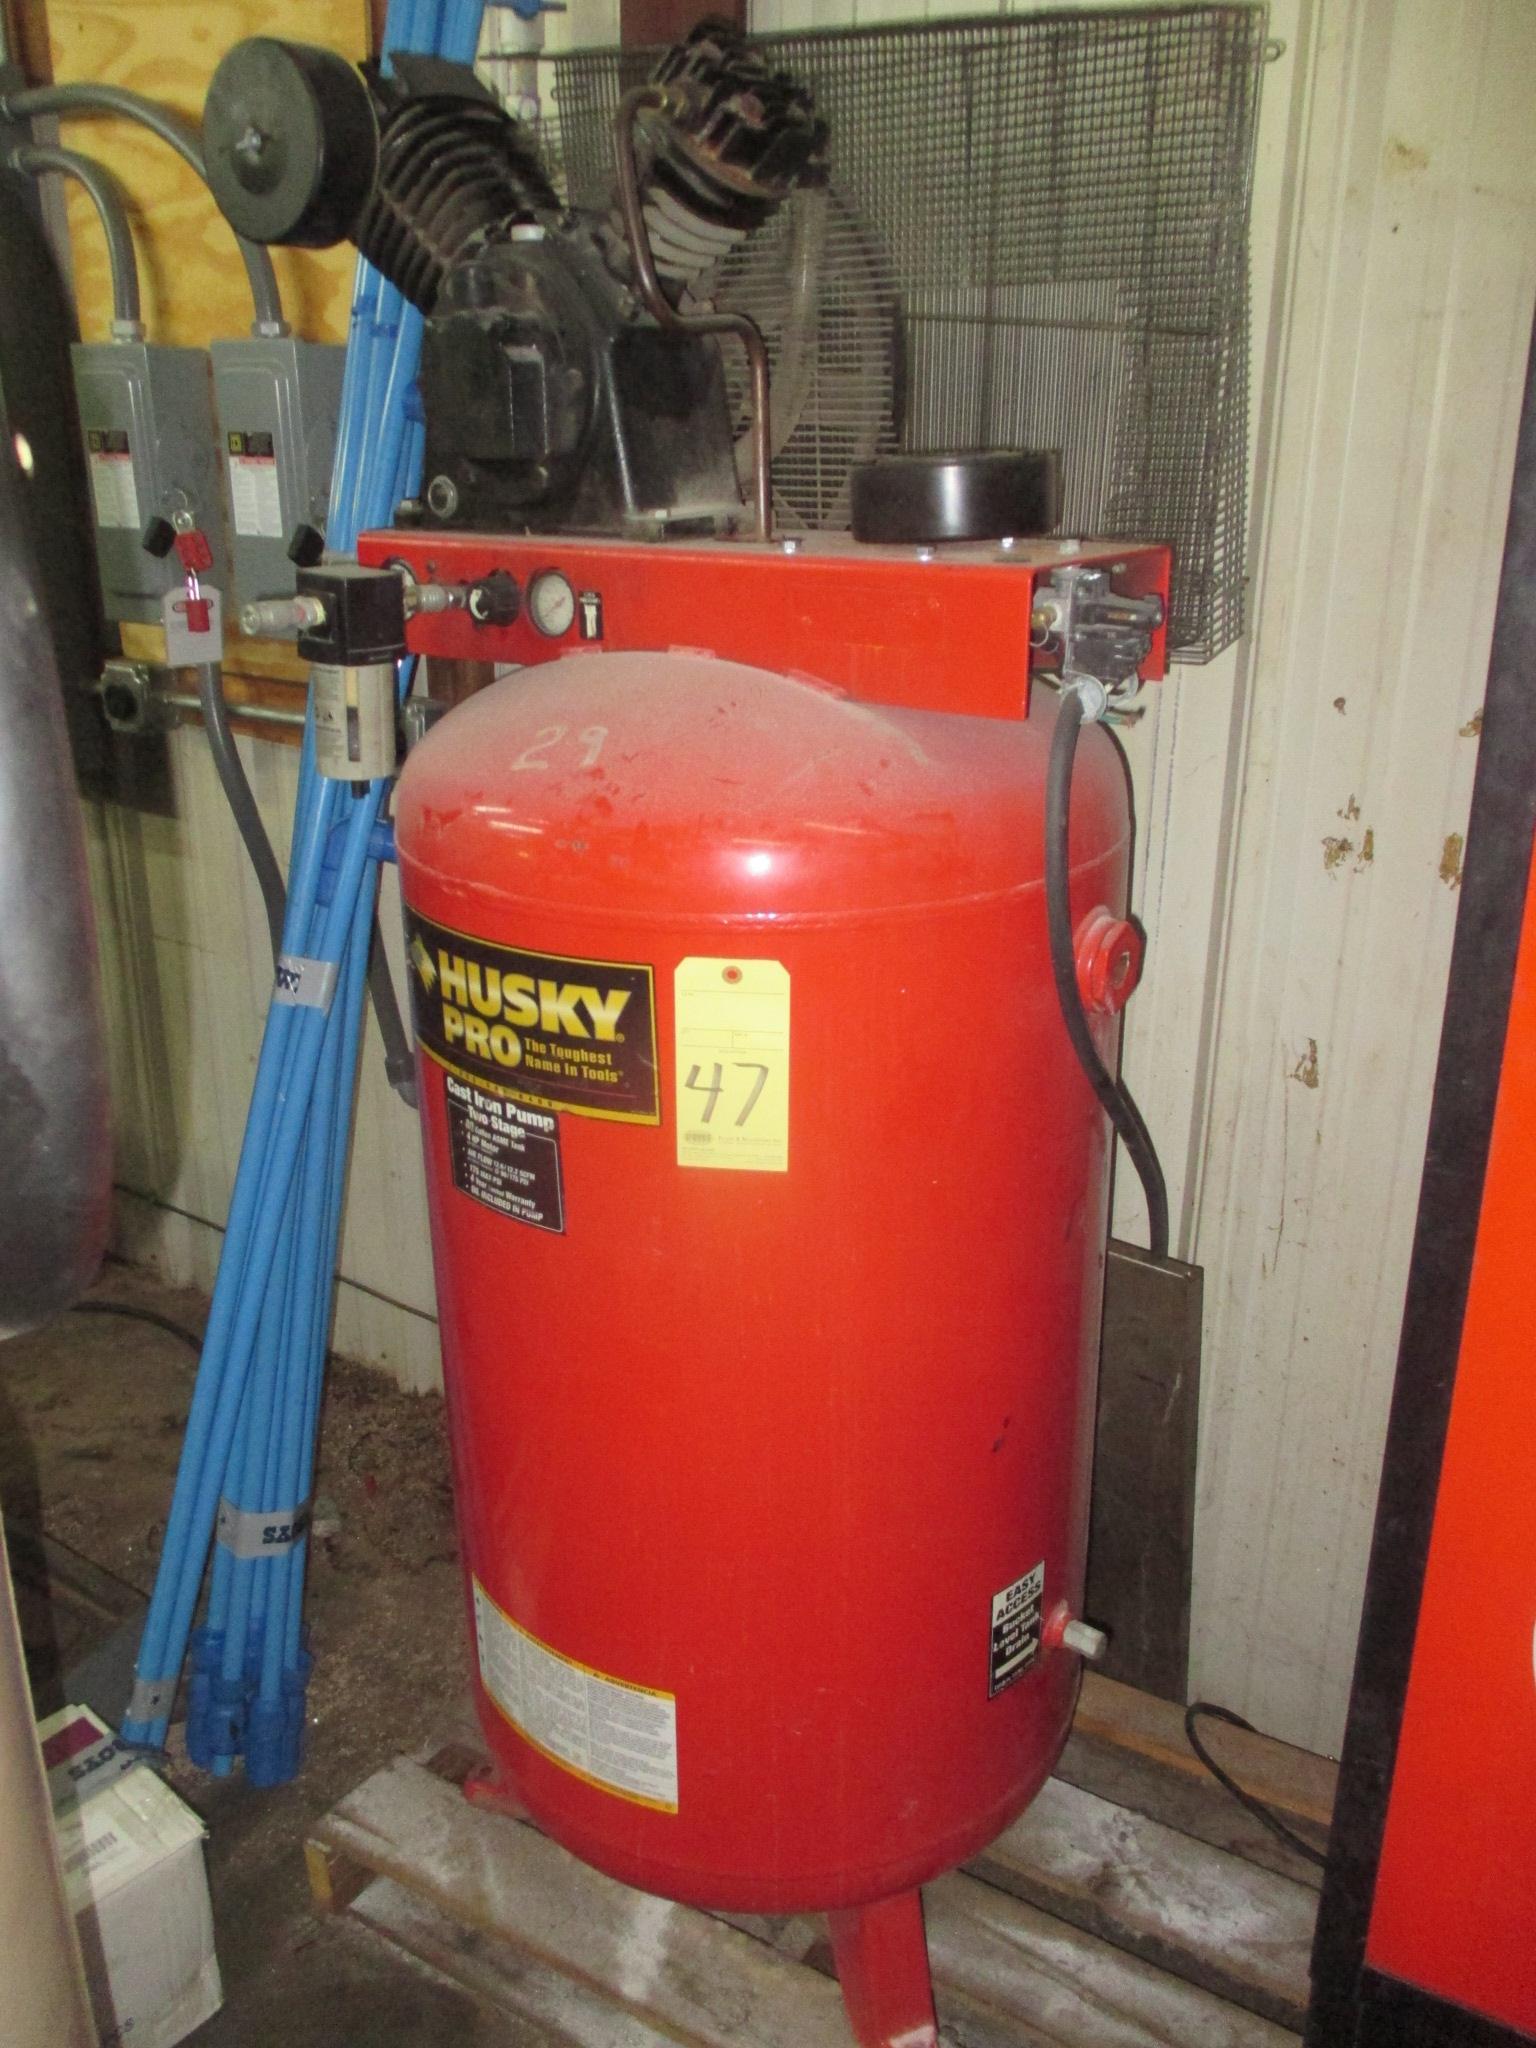 Lot 47 - RECIPROCATING TYPE AIR COMPRESSOR, HUSKY, 4 HP motor, 80 gal. vert. tank, 12.2 SCFM @ 90 PSI (